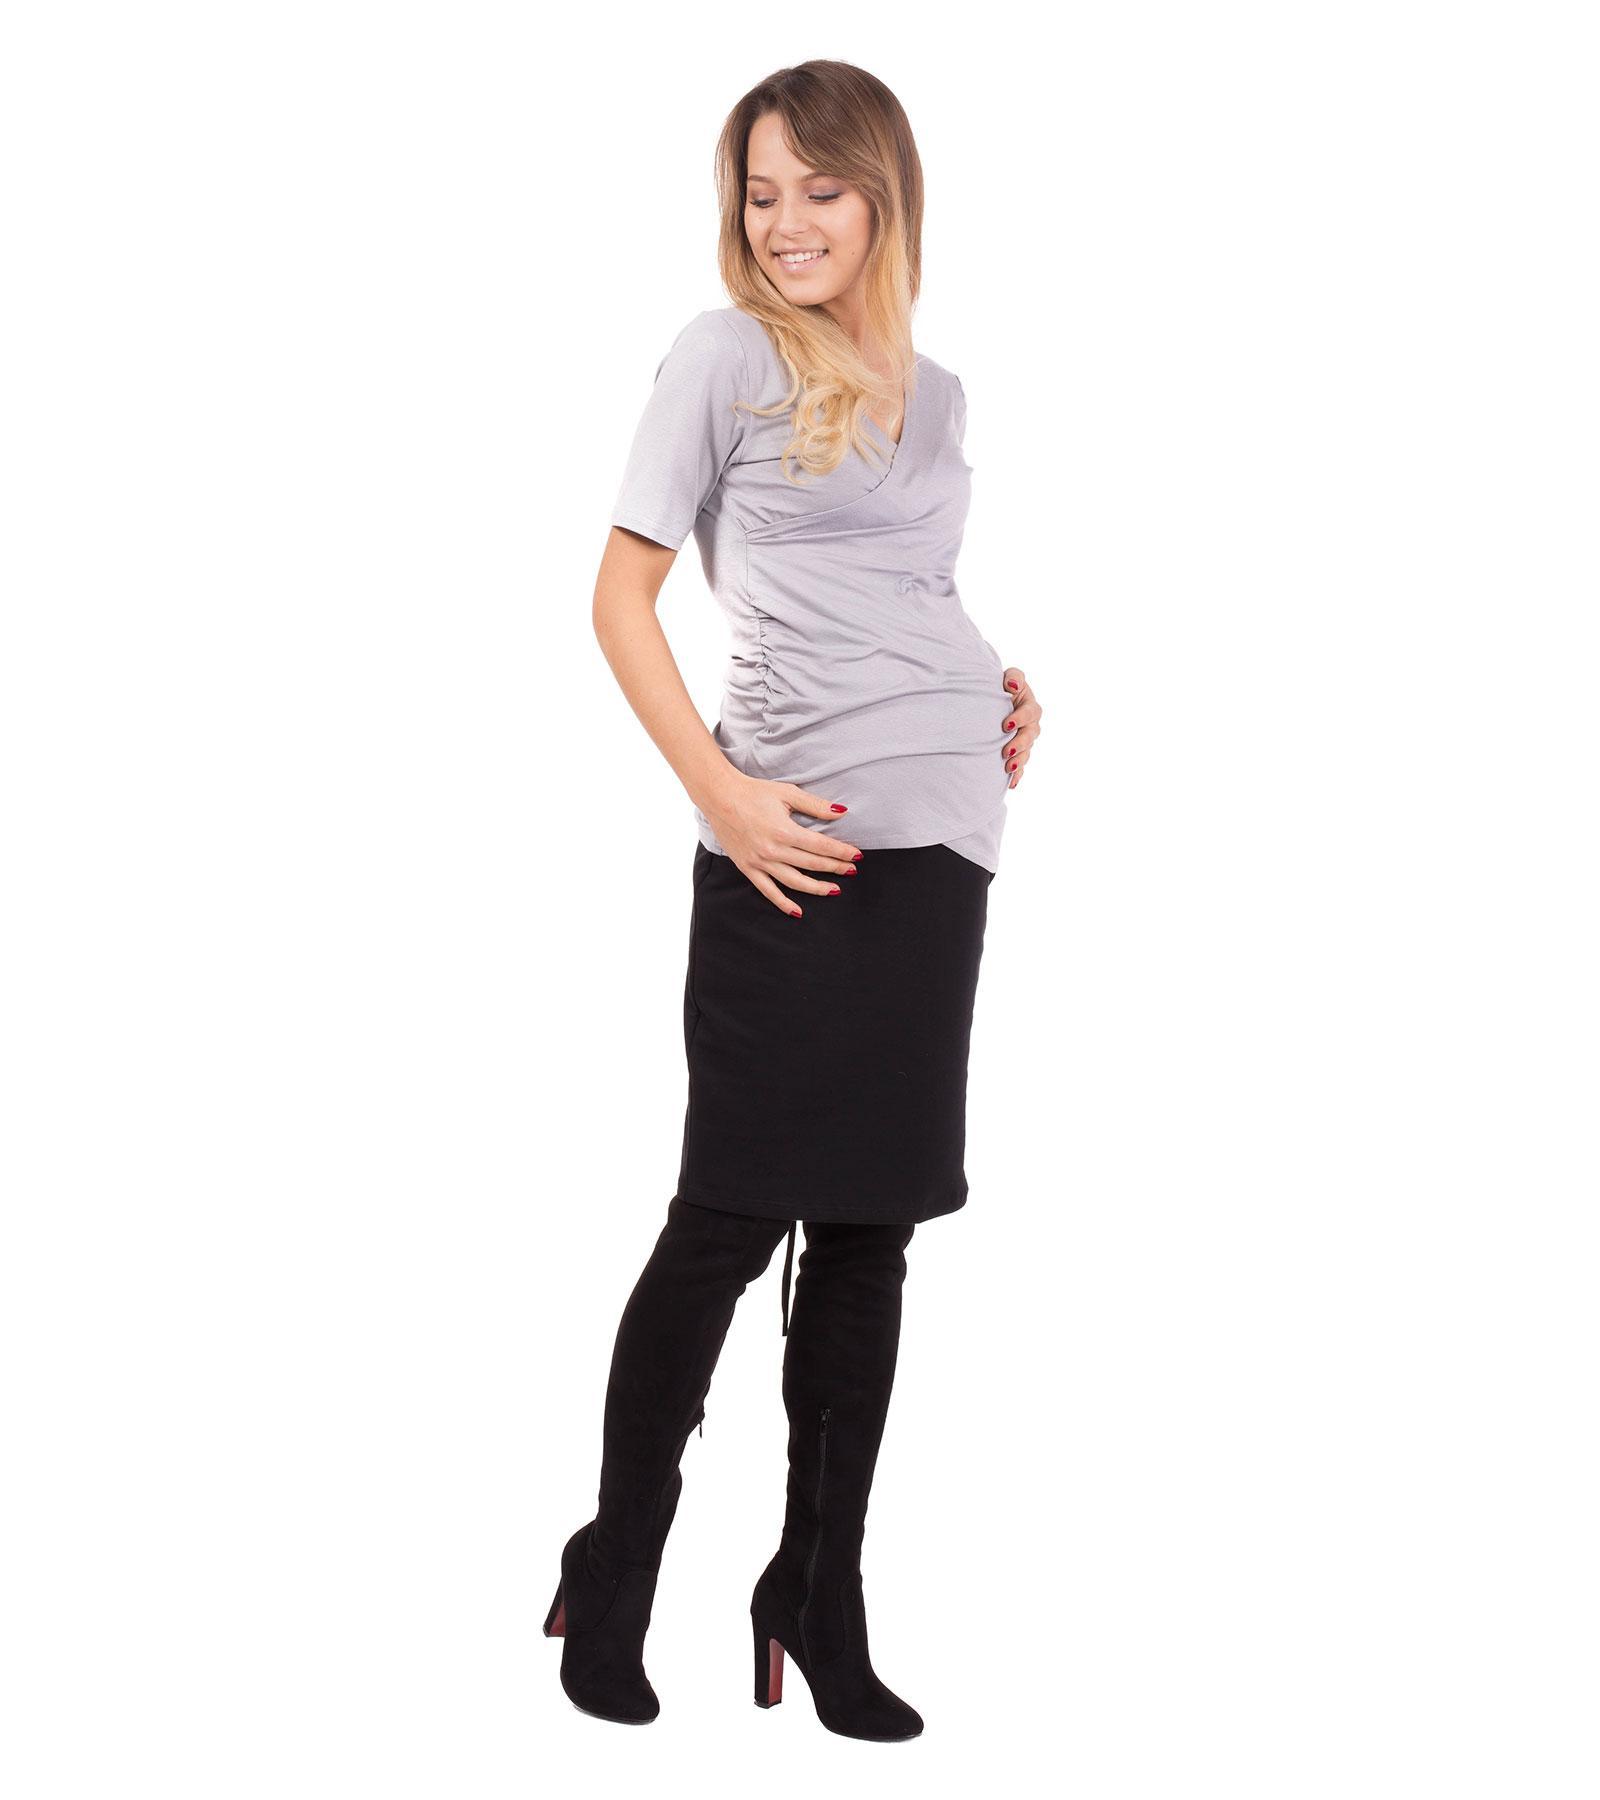 Czarna spódnica ciążowa Kelly Bensini®